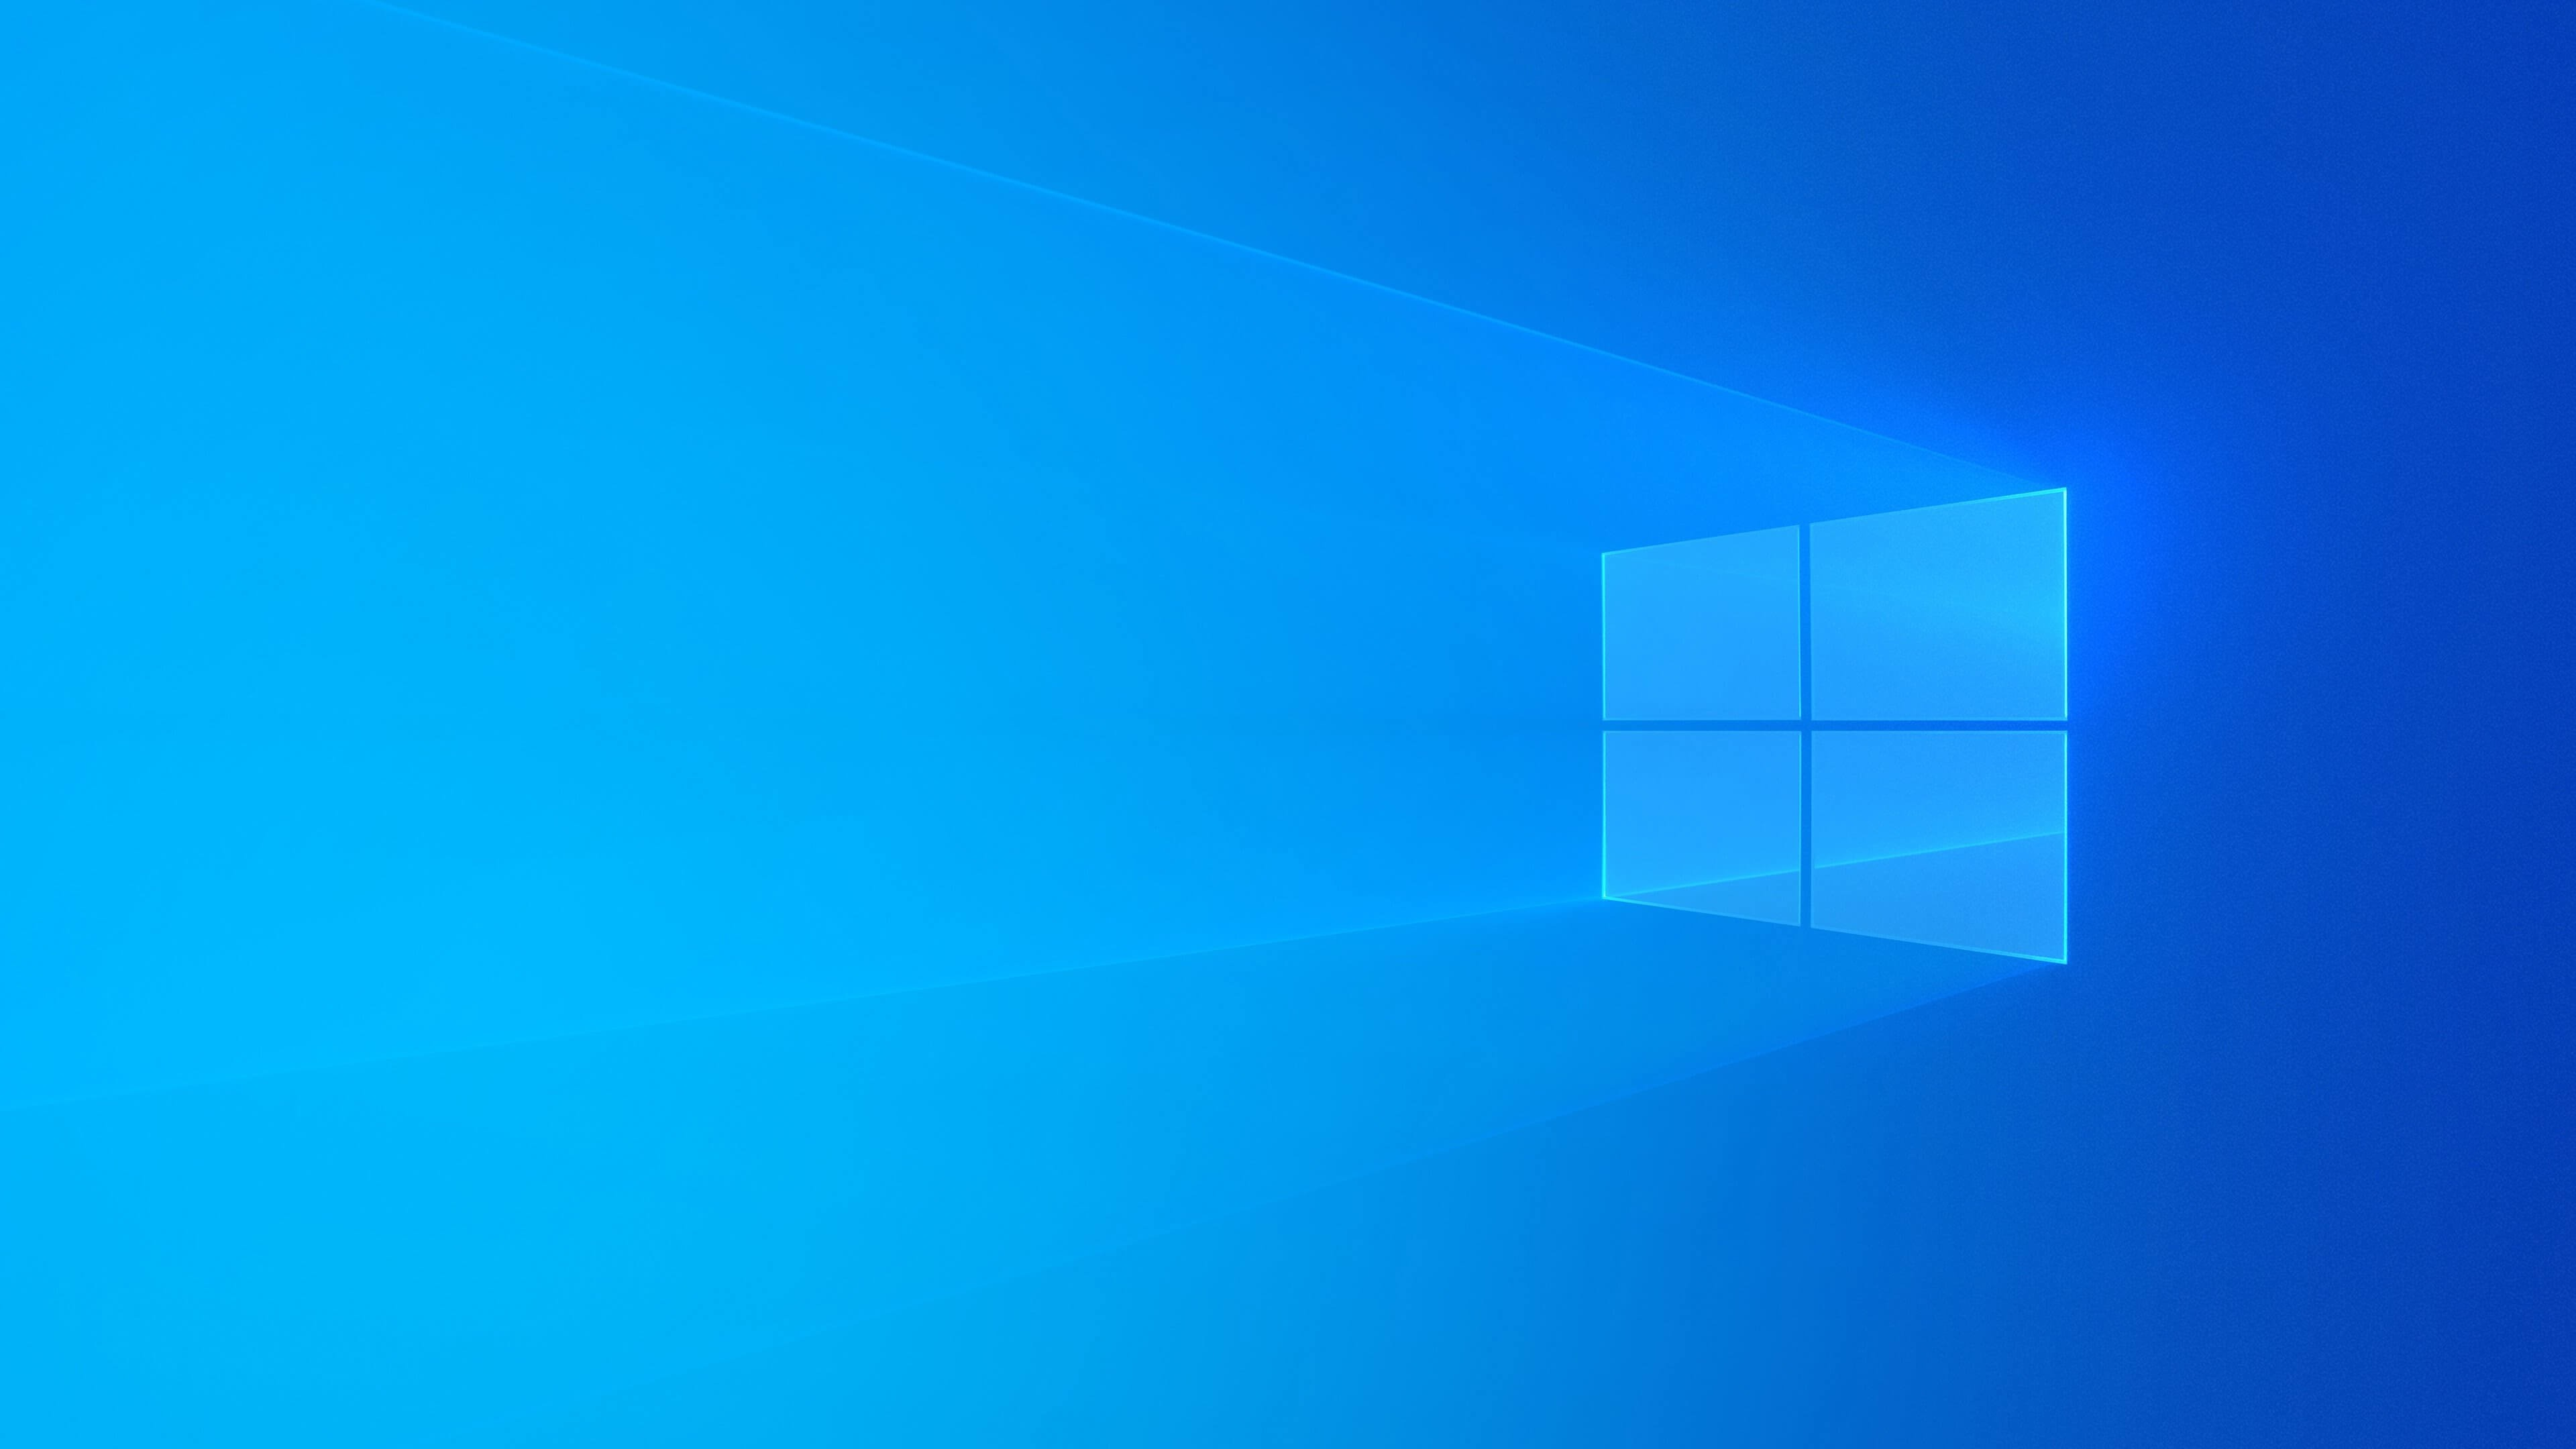 Wallpaper Windows 10 Blue Background Light Abstract